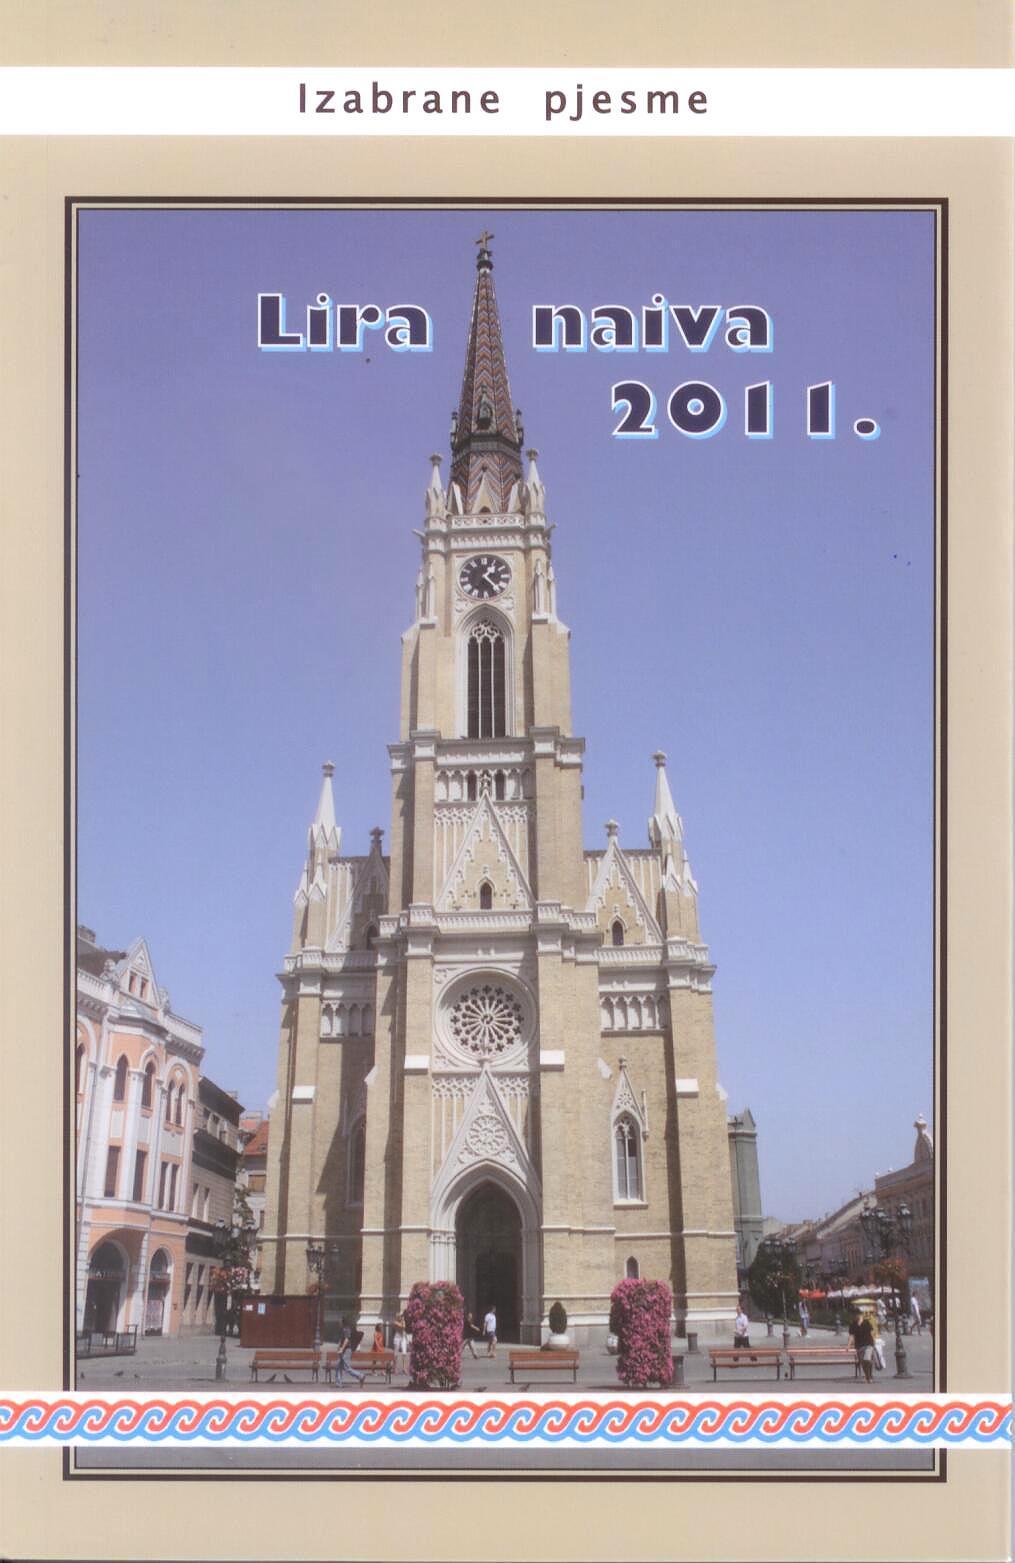 Lira naiva 2011